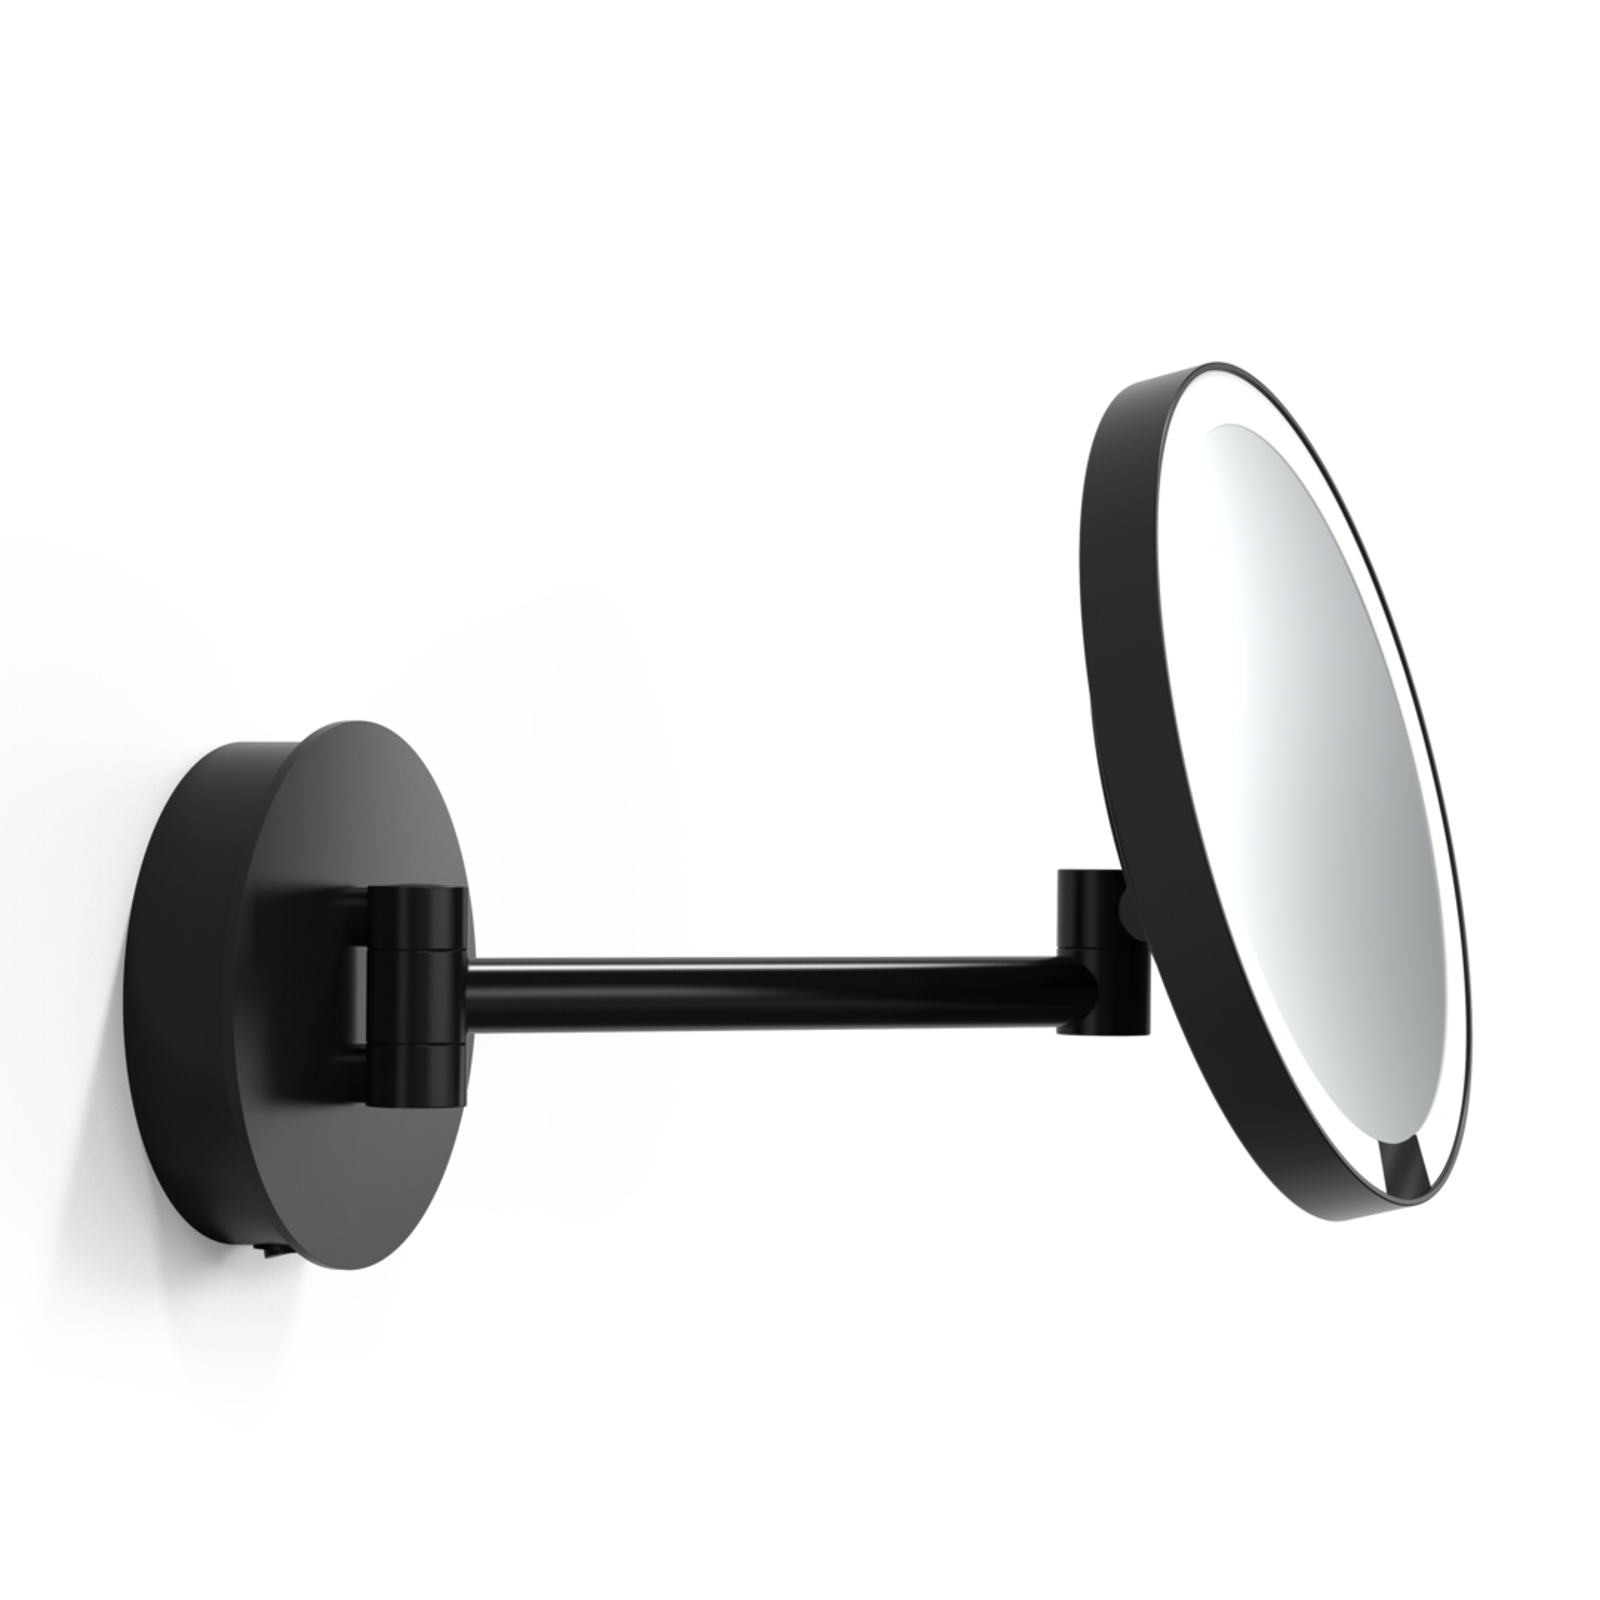 Decor Walther Just Look WD LED-veggspeil, svart